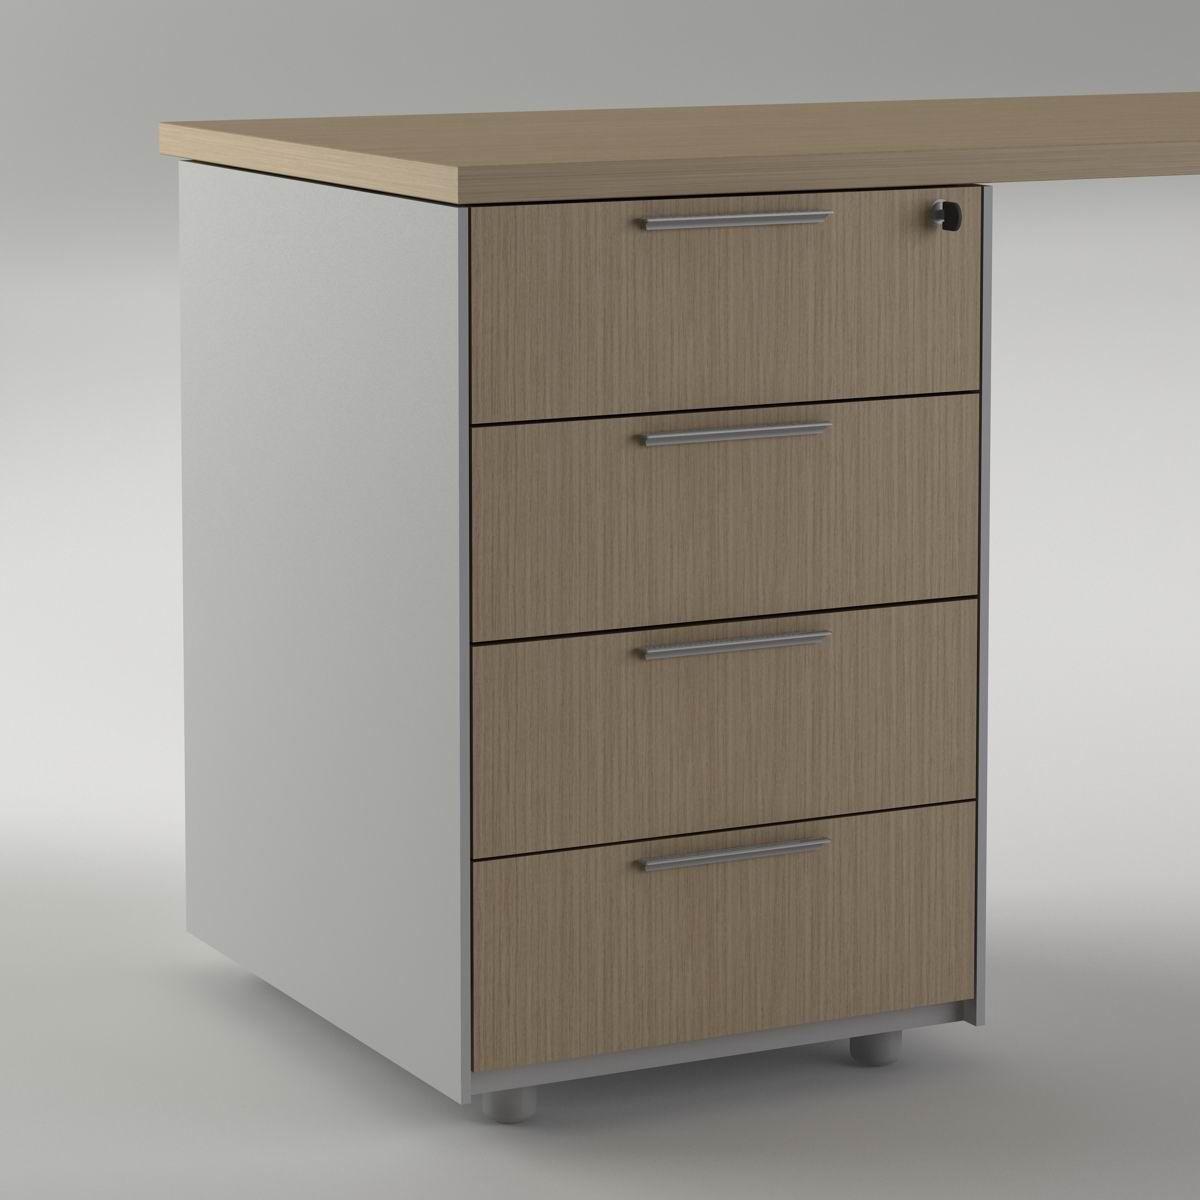 Mascagni Büromöbel Toptip Salontisch Kernbuche Interior Design T